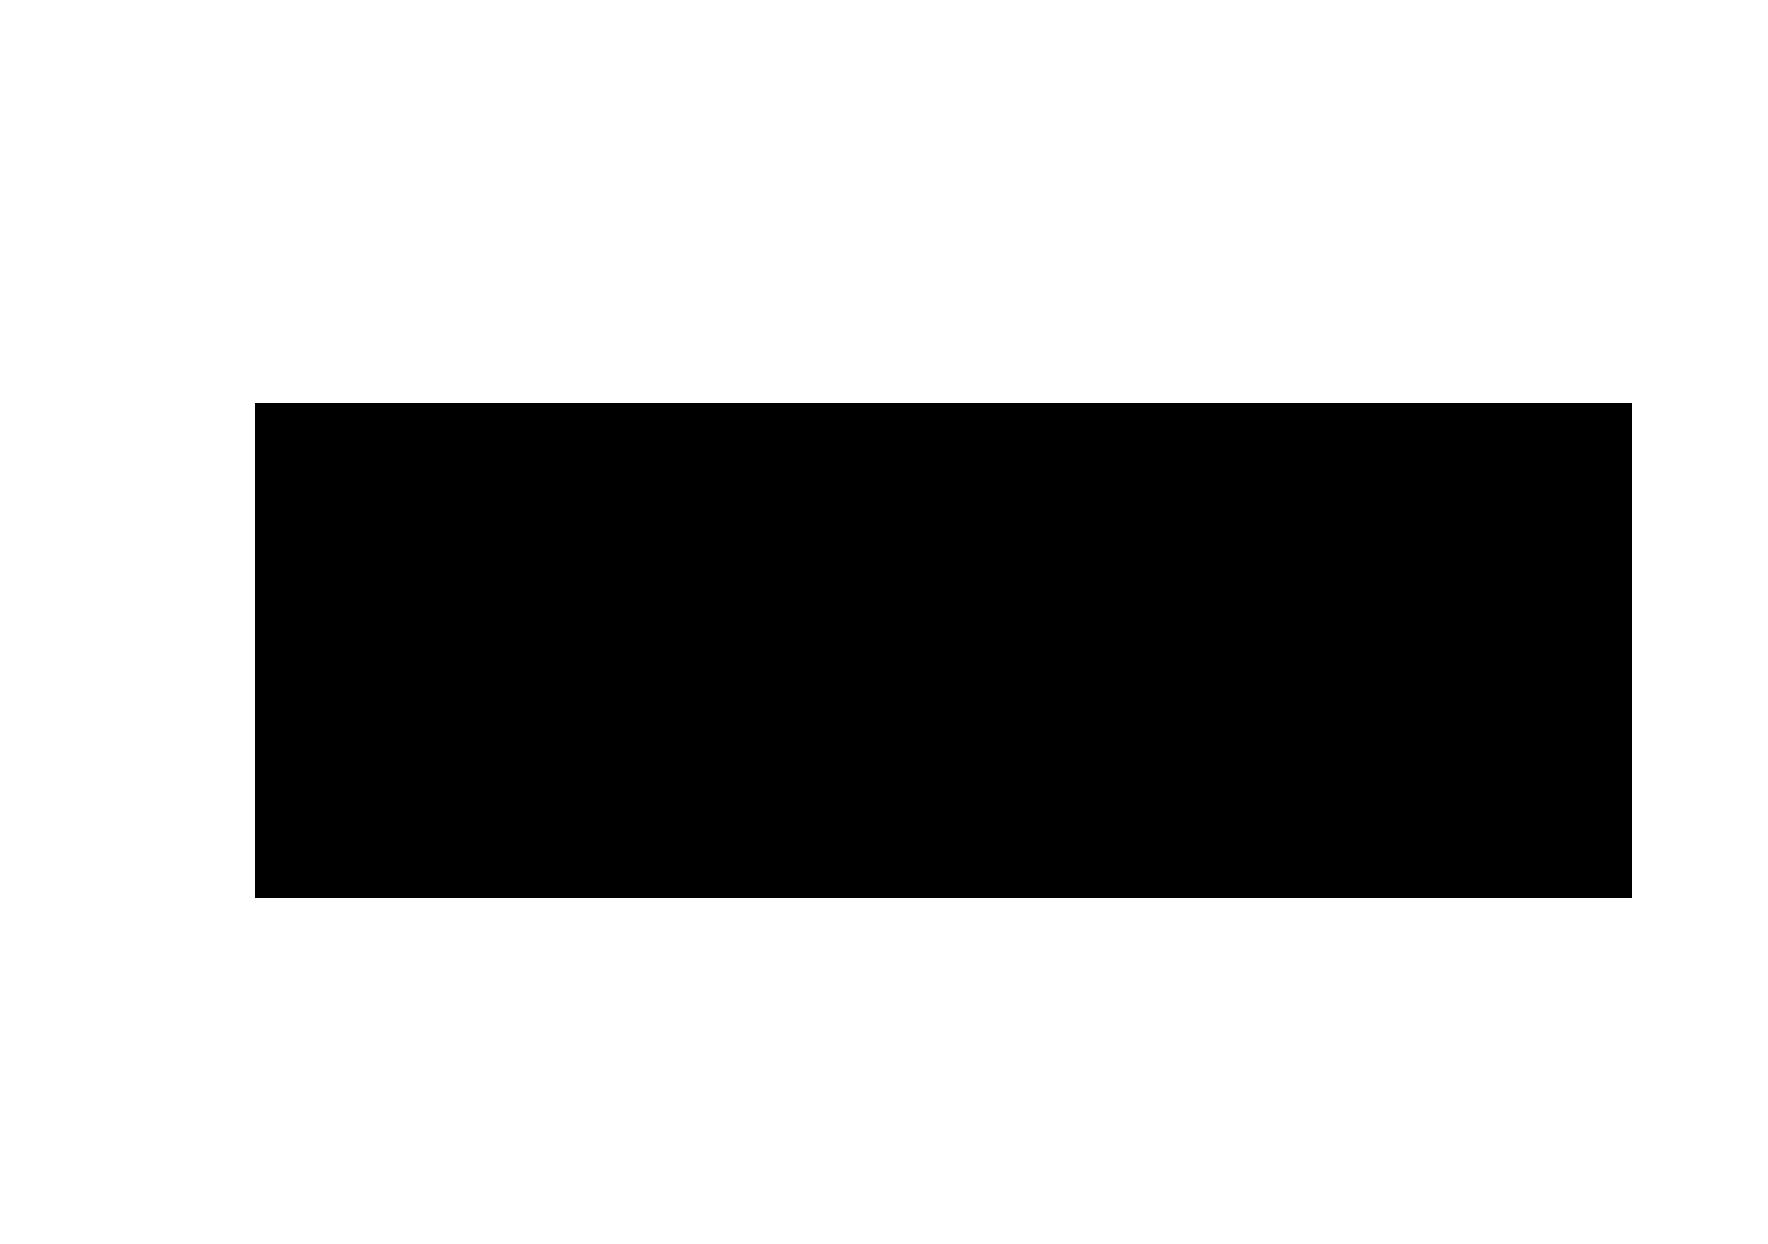 مخطوطه رمضان كريم مفرغه 4 15 مخطوطه لشهر رمضان بالخط الحر png